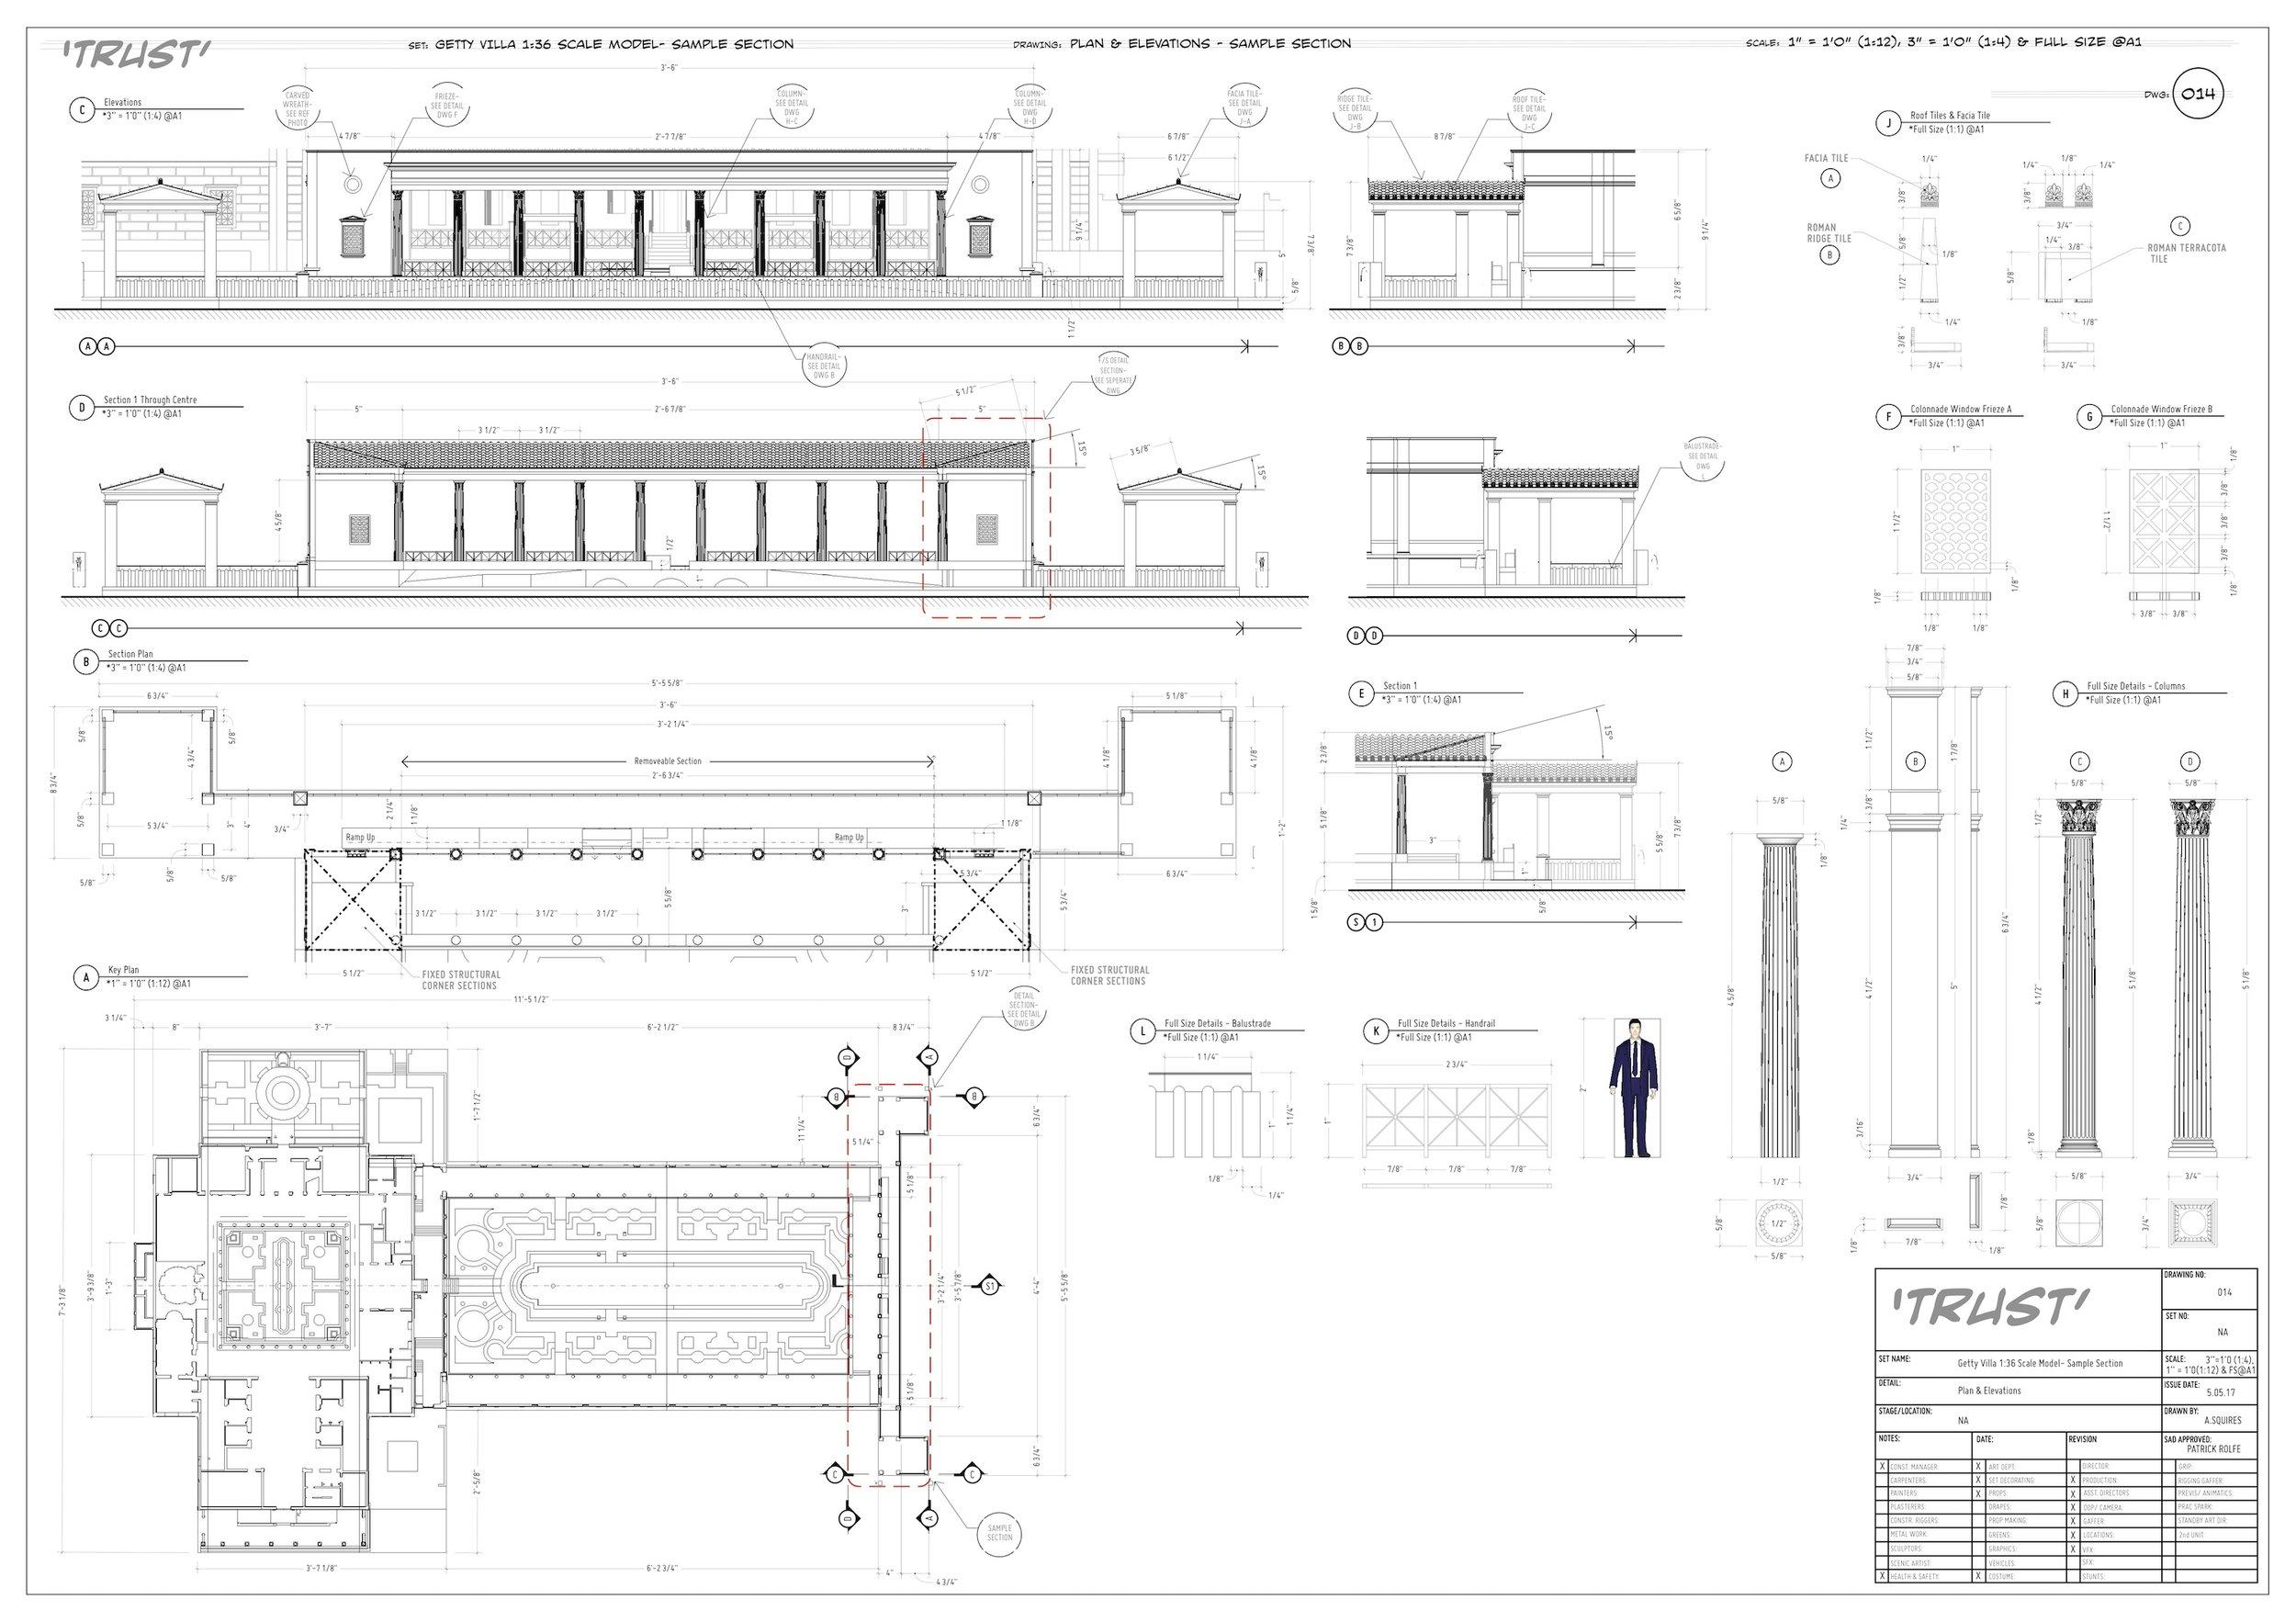 Trust_Getty Villa_1-36 Scale Model_Adam Squires 2018.jpg